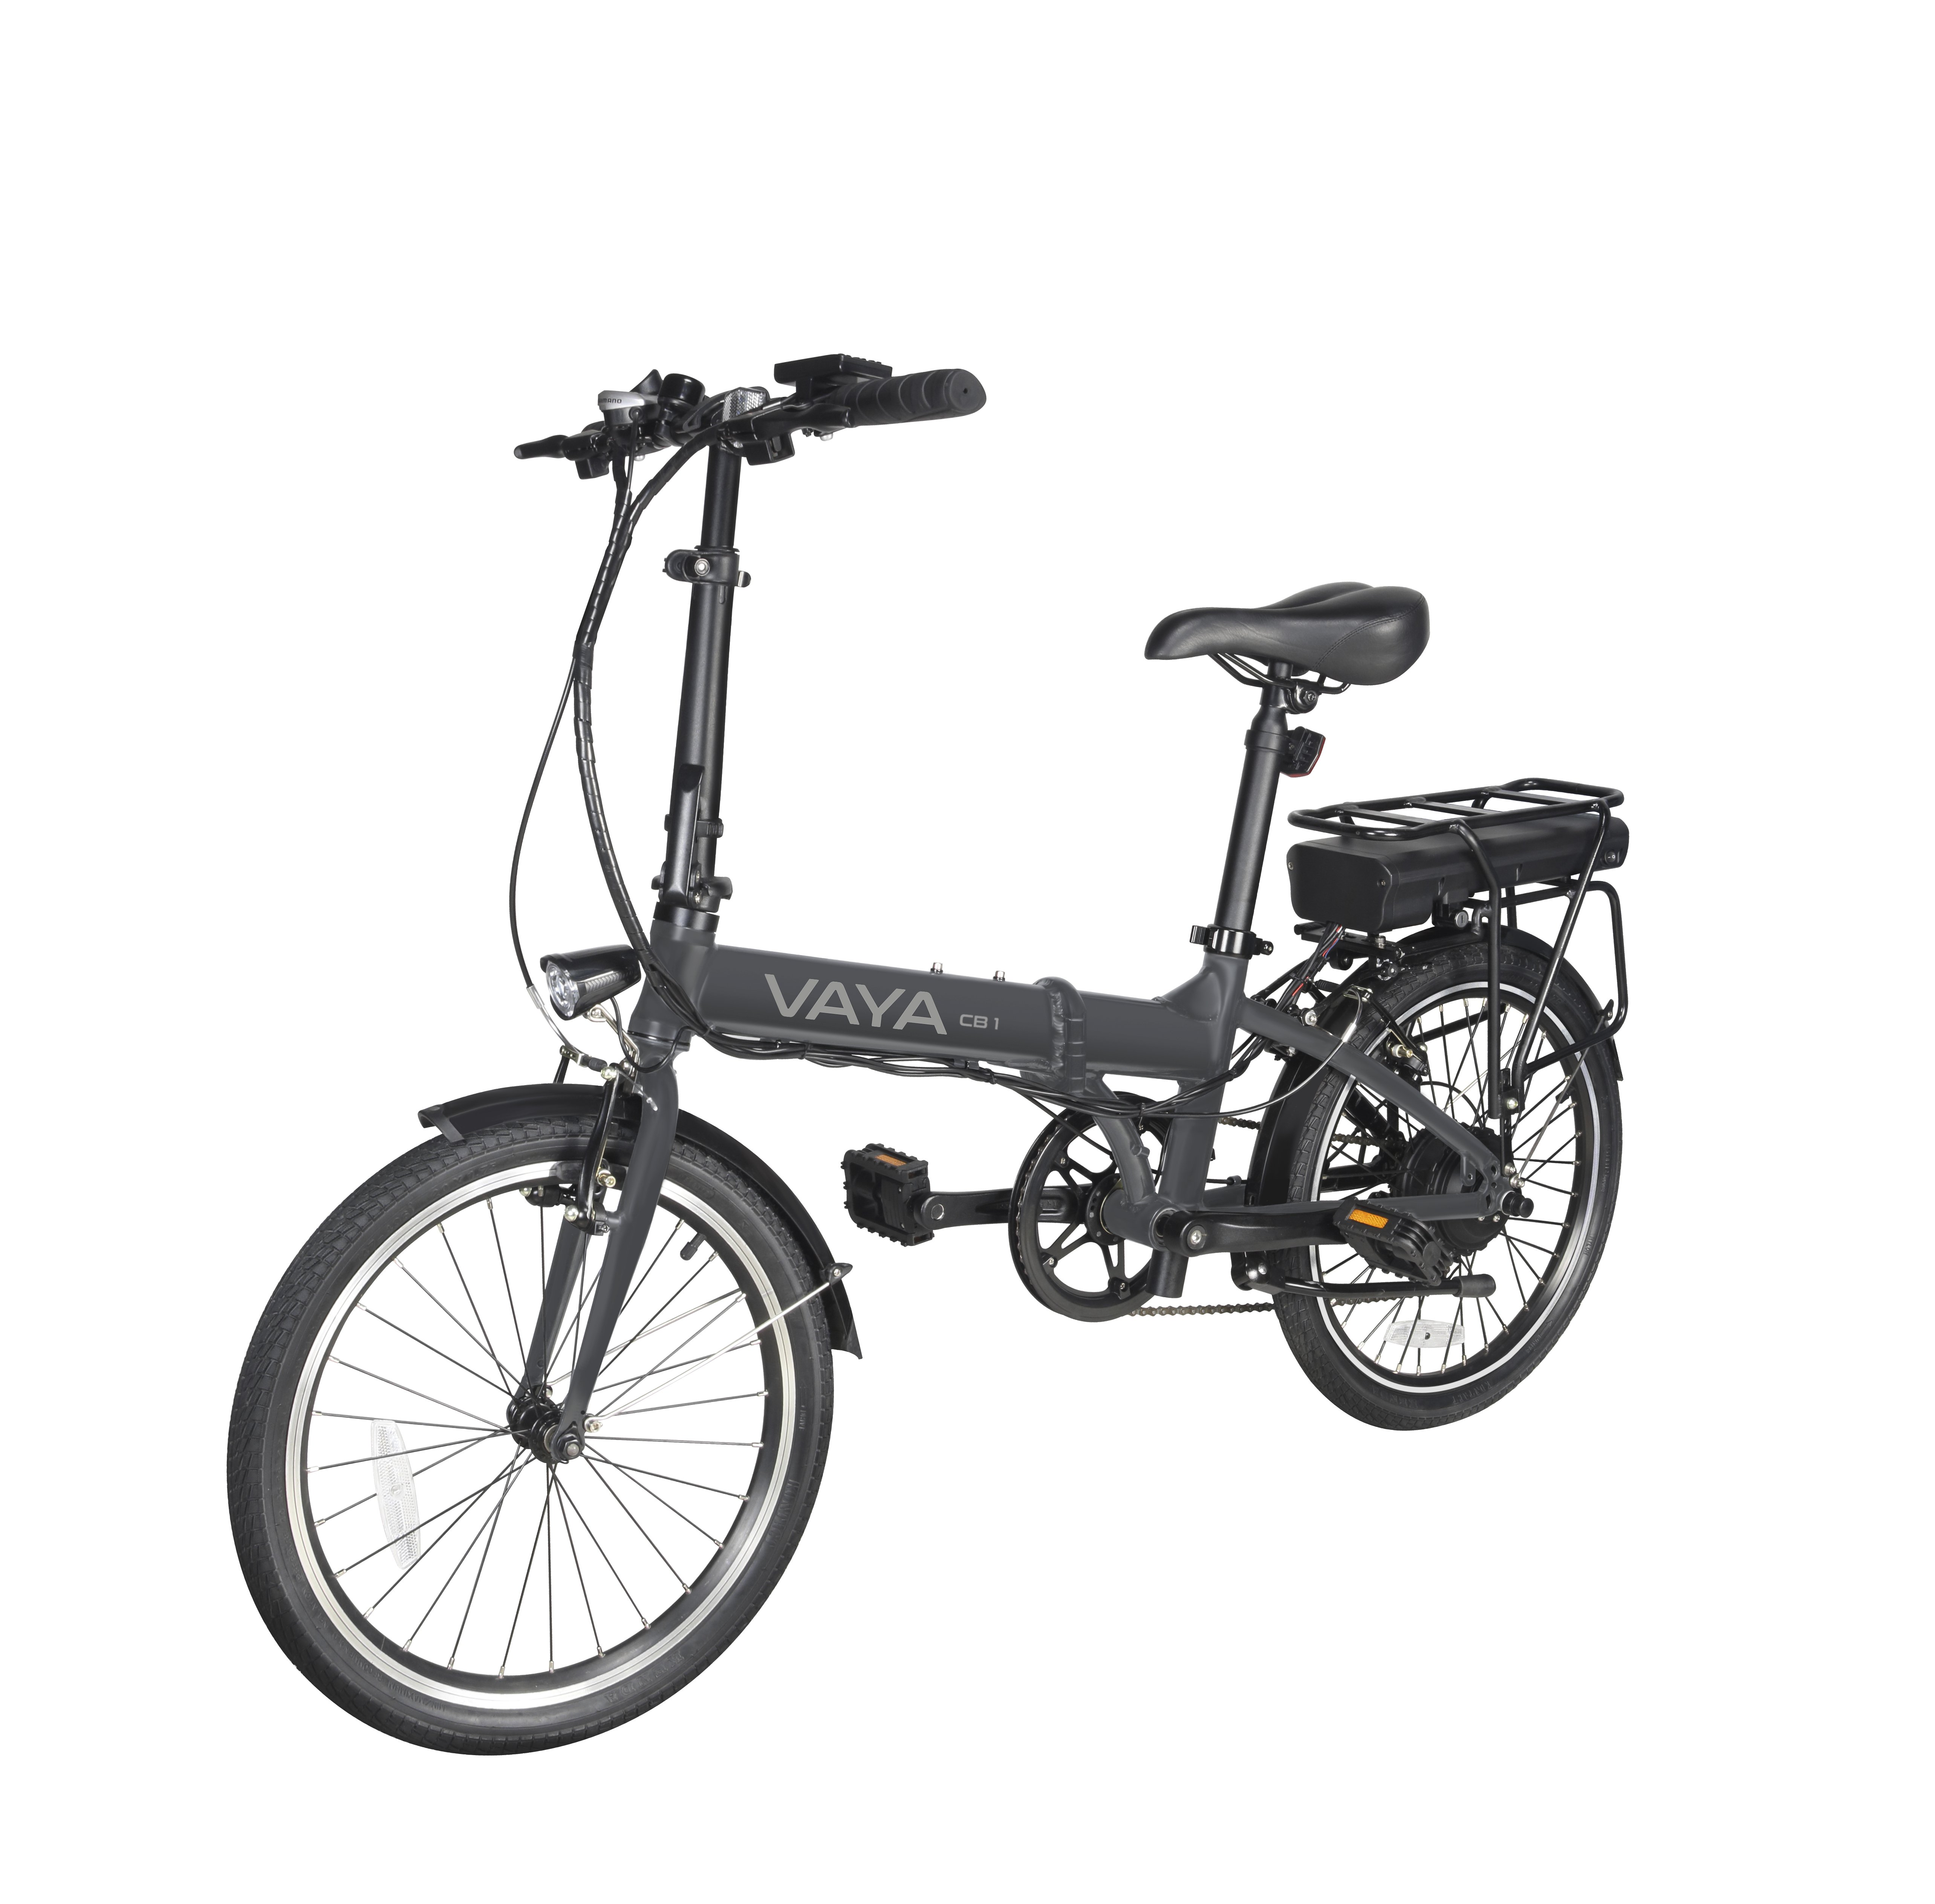 Vaya - CB-1 Electric City Bike - Dark Grey (1641DG)